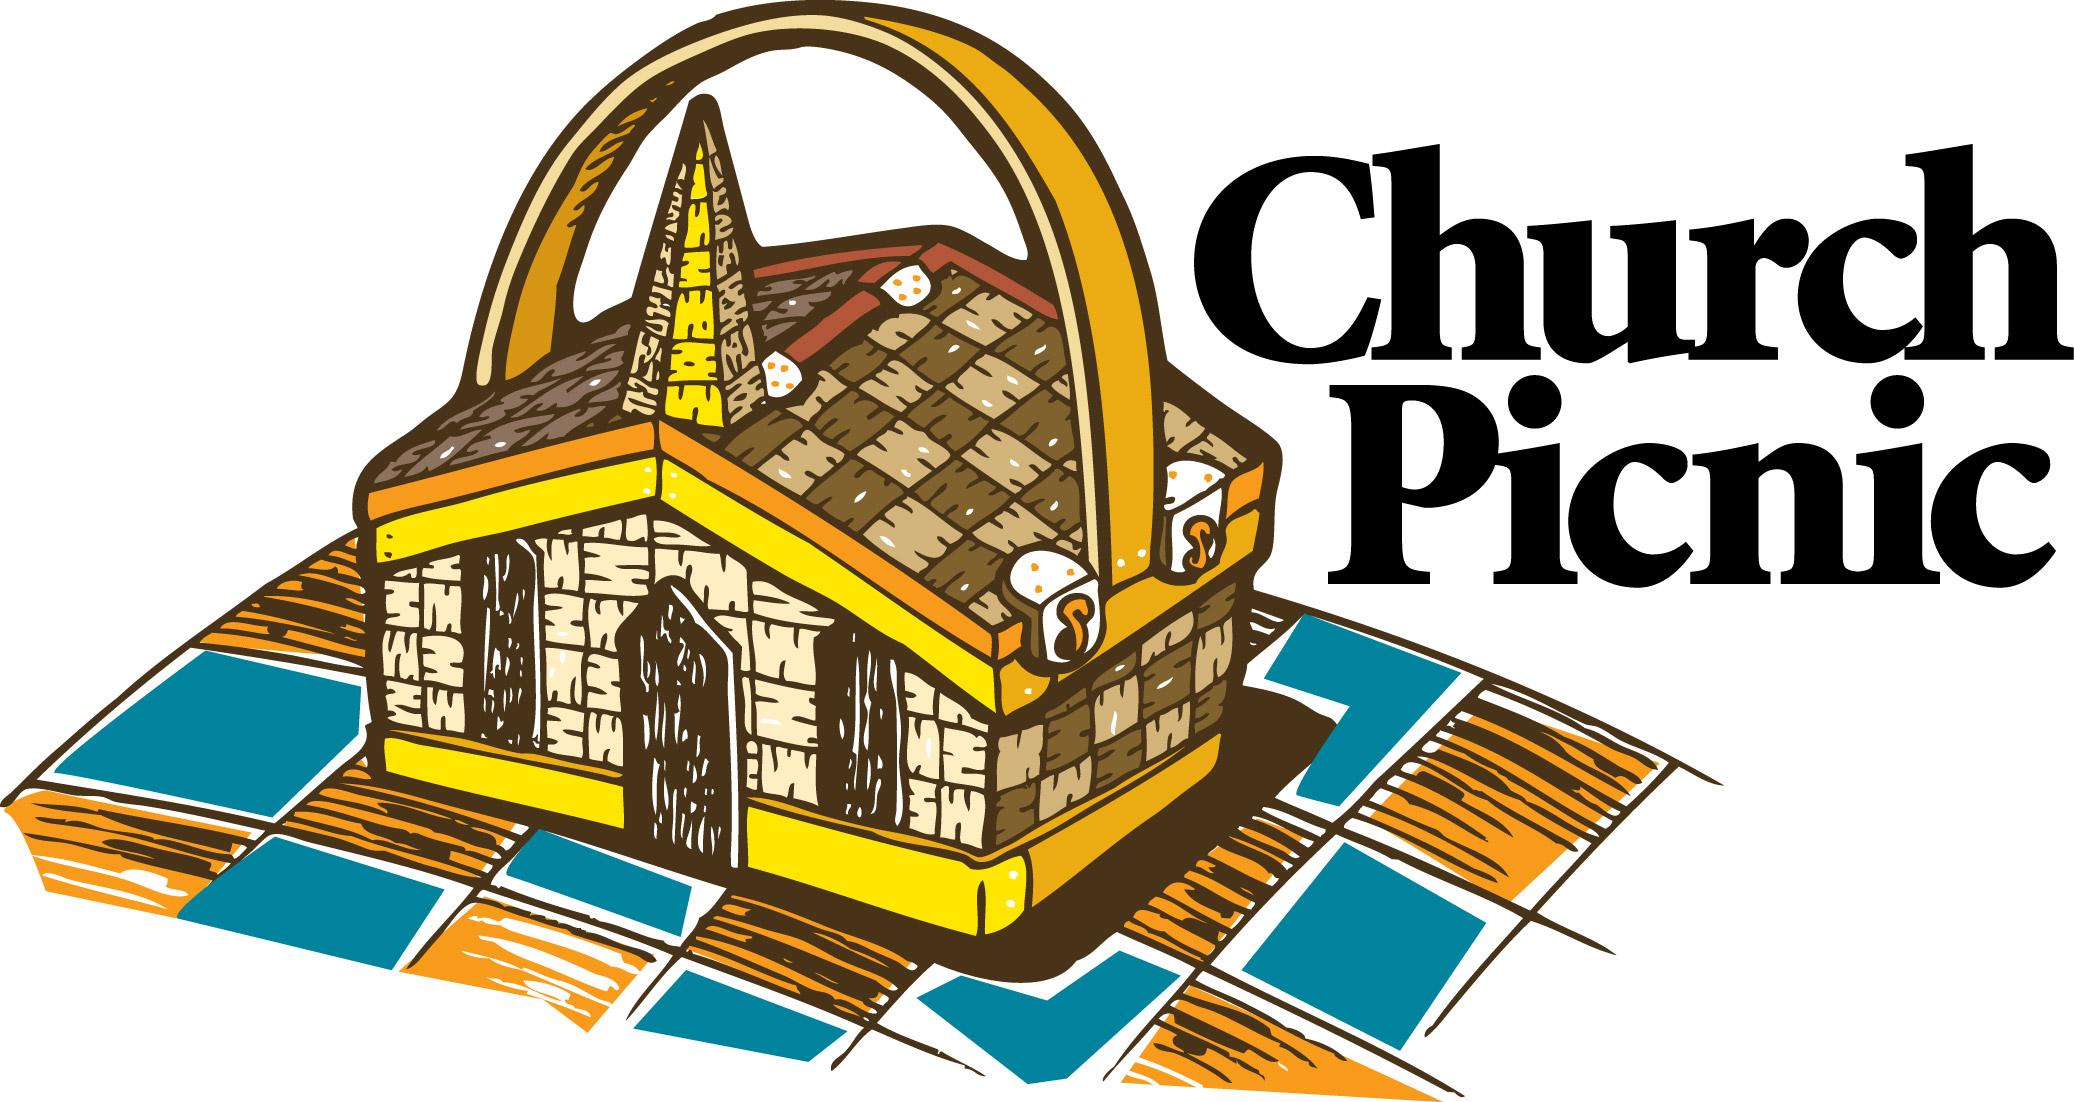 Church Picnic Clip Art N15 free image.